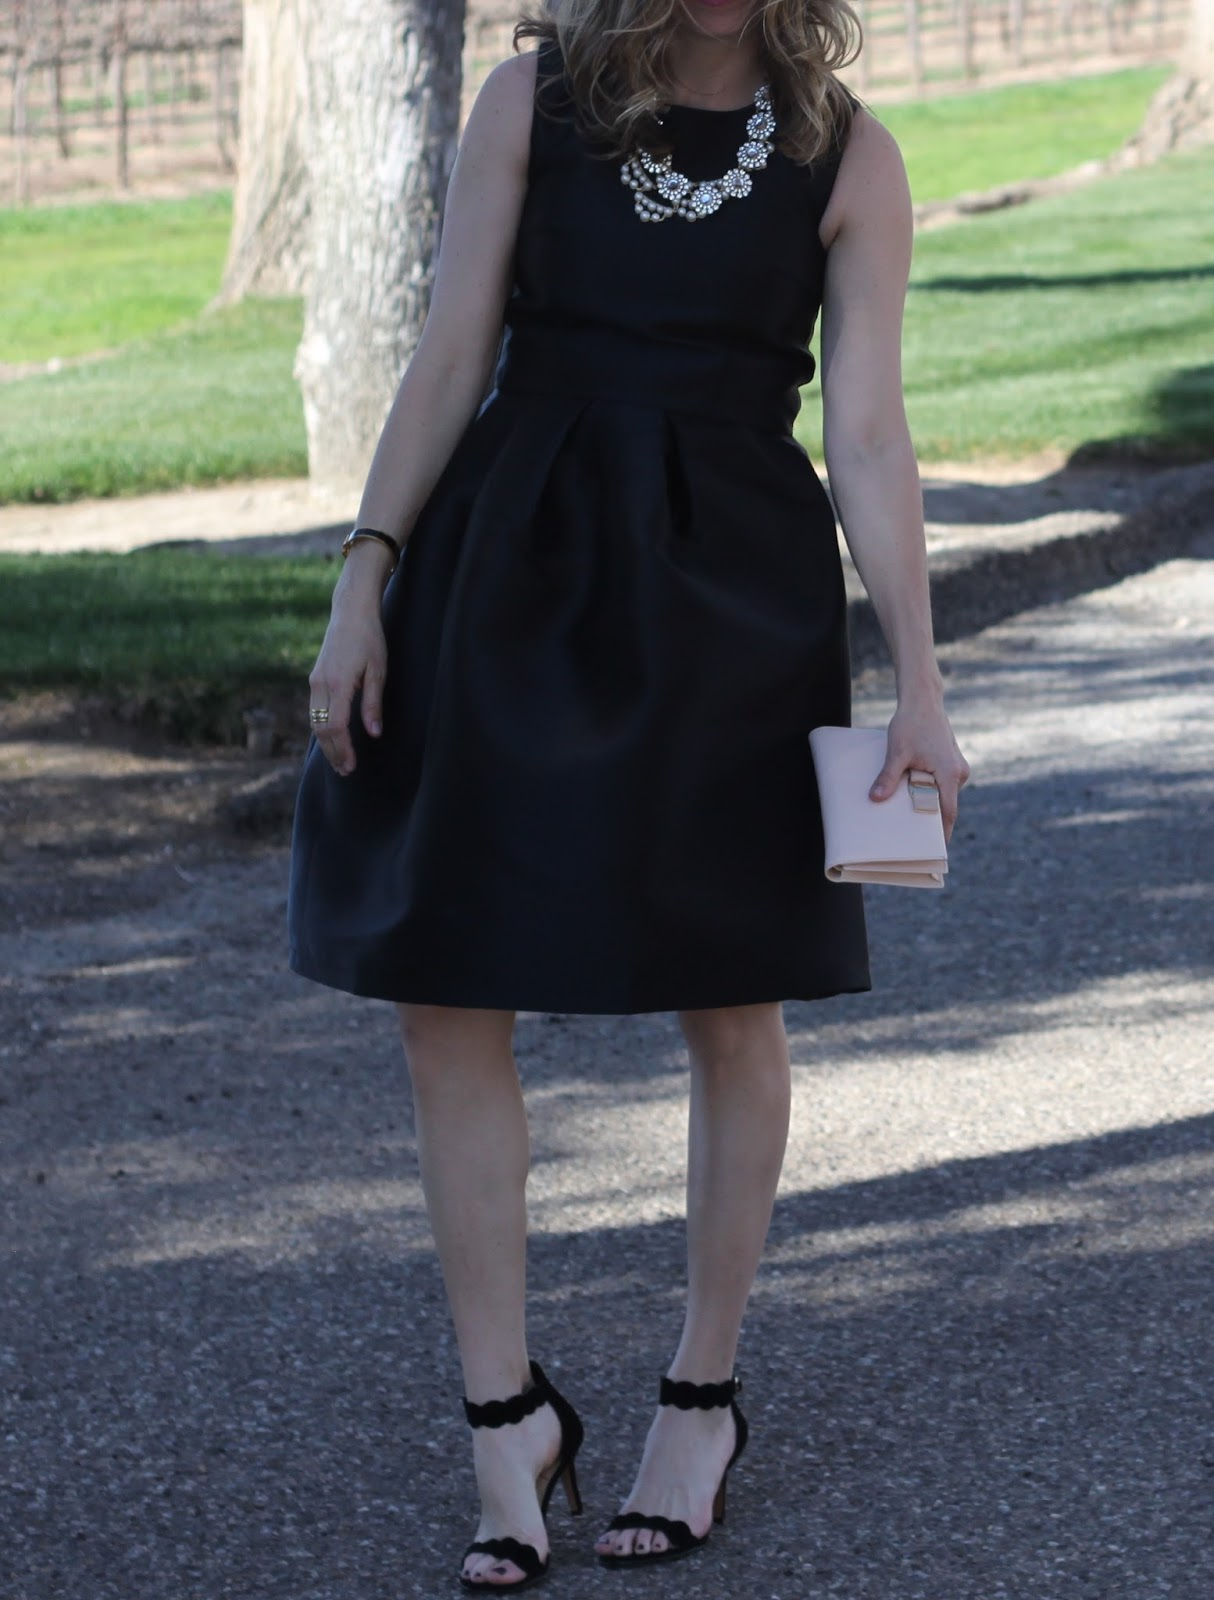 black satin midi skirt and top